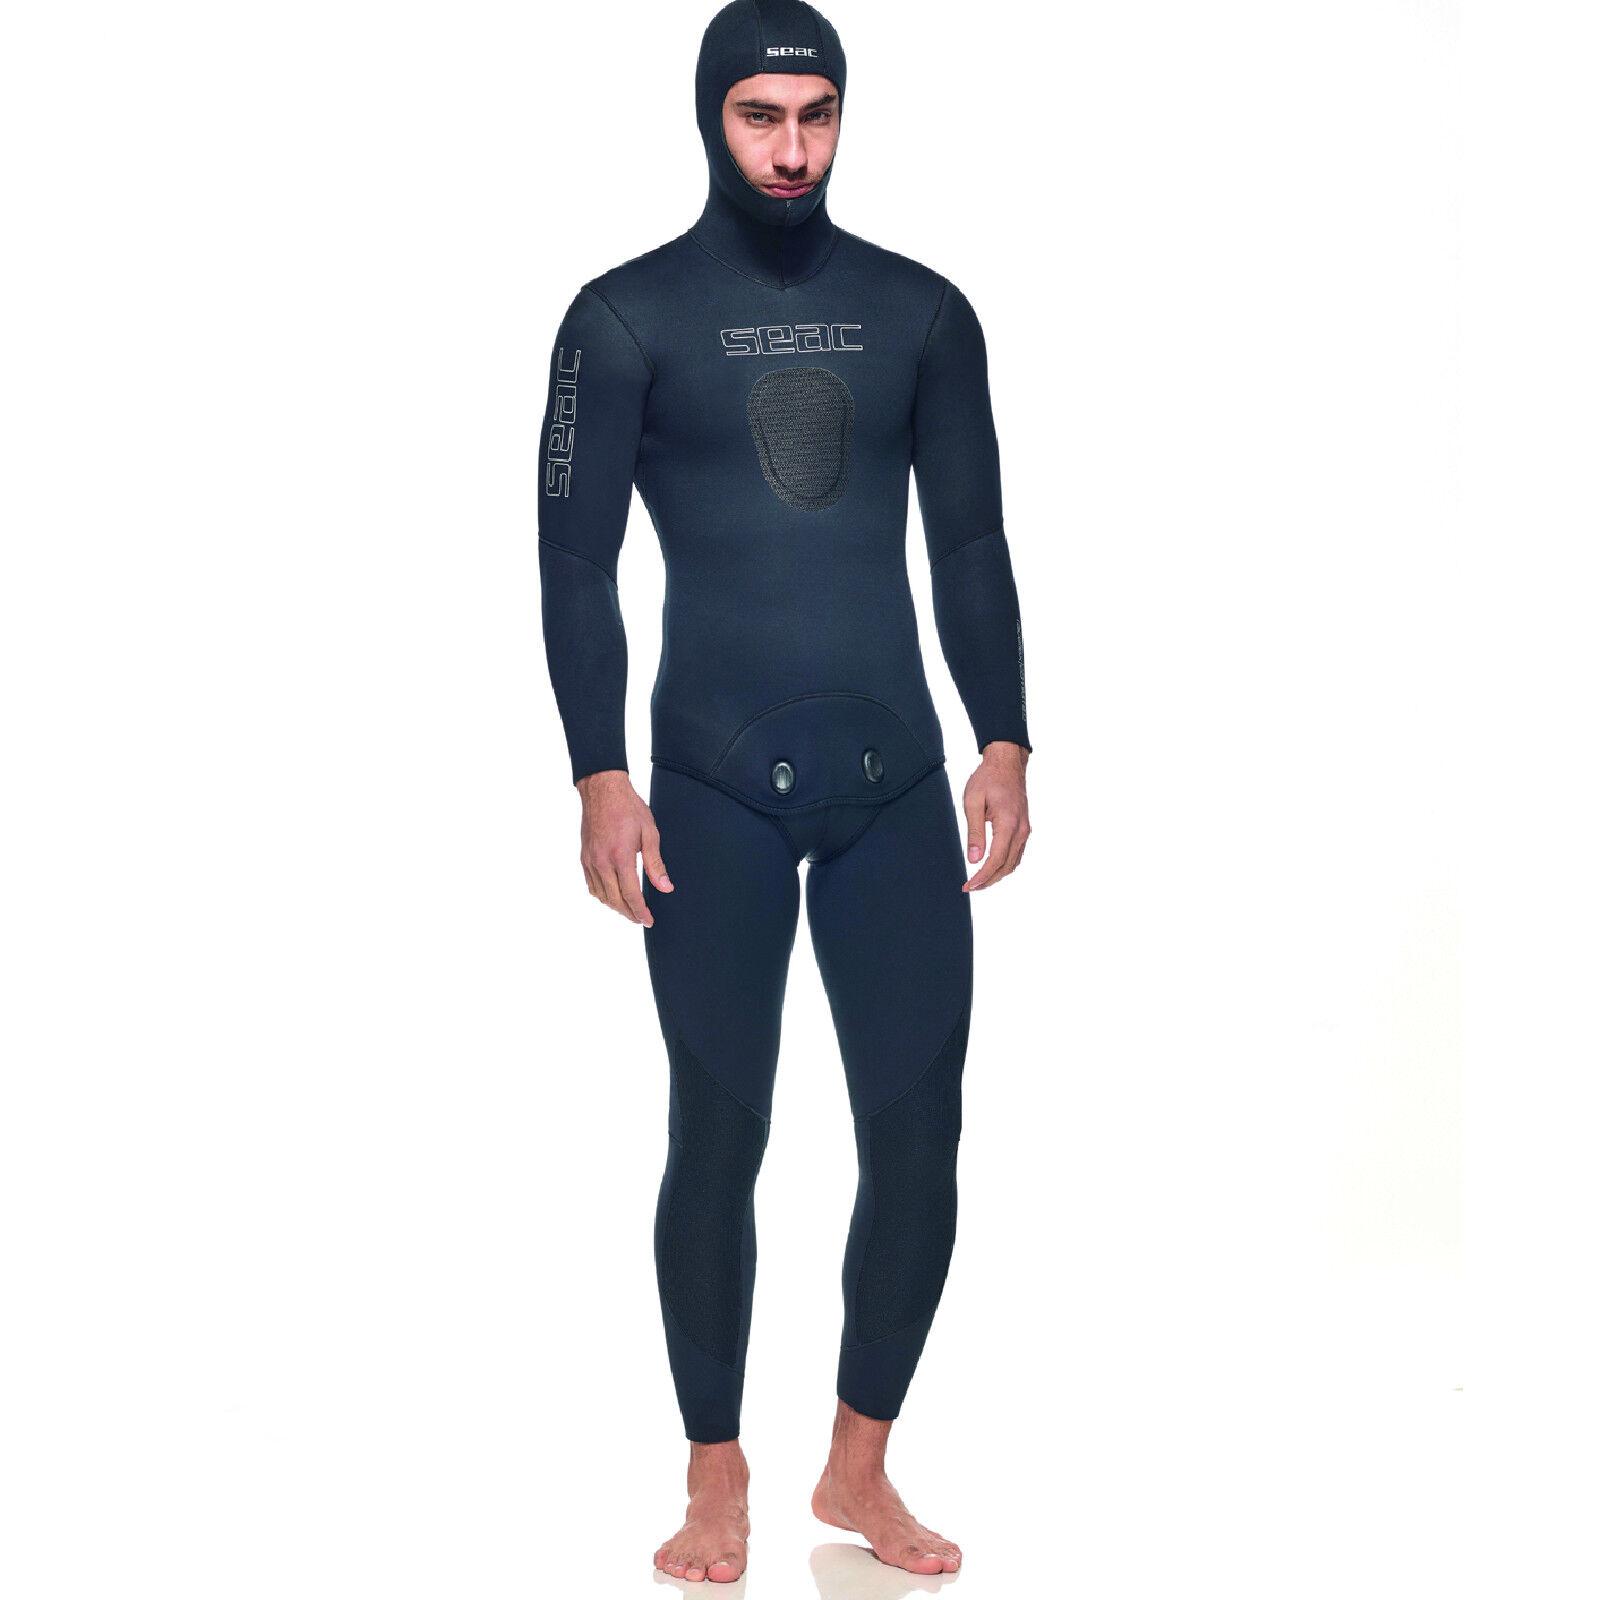 RO1 Seac Sub Muta APNEA PESCA RACE FLEX confort giacca 7mm pantalone 5mm